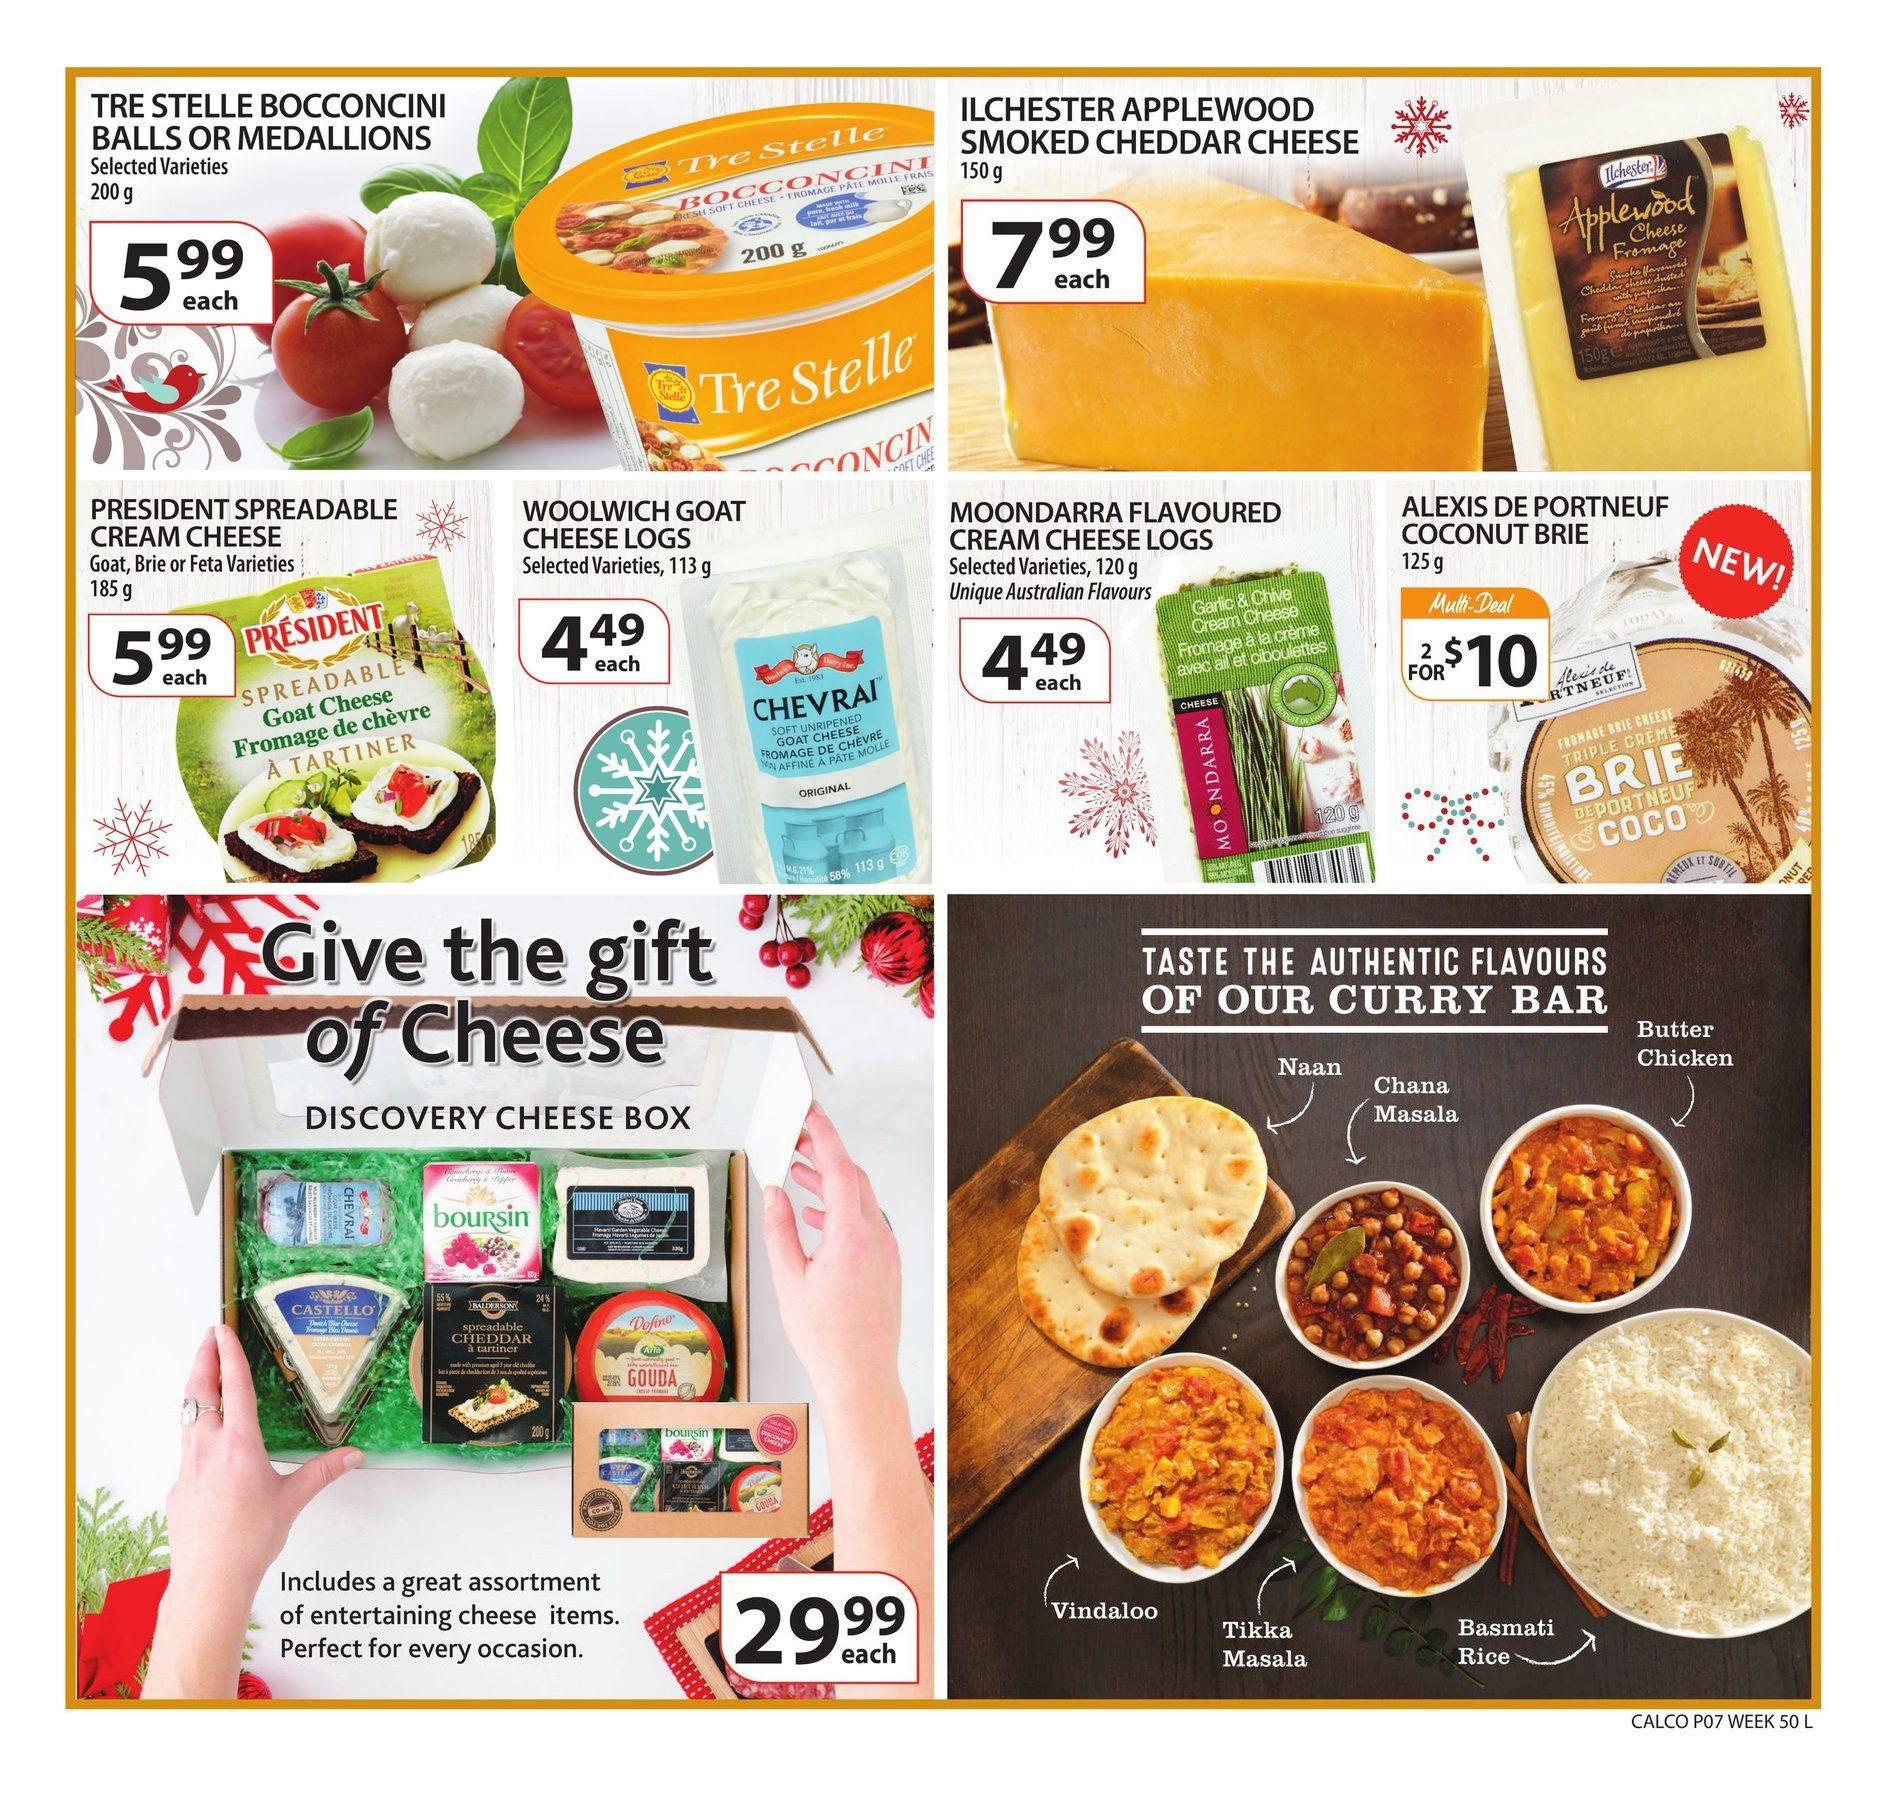 Calgary Coop Weekly Flyer Specials Dec 9 15 Greenfields Yogurt Mango 125g